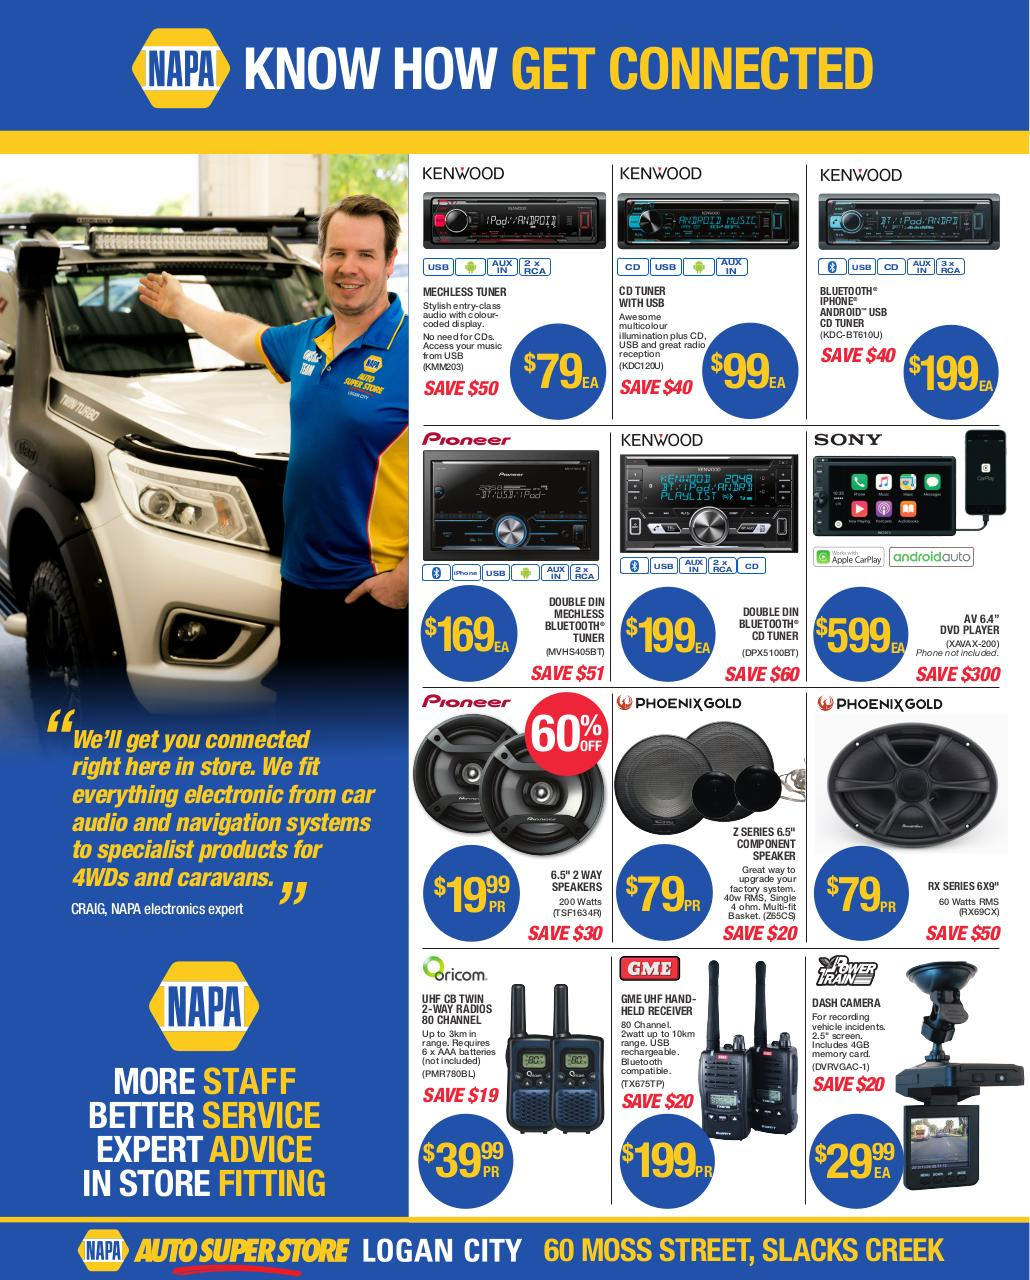 589750 NAPA Auto Super Store Catalogue 8pp FINAL - PDF Archive